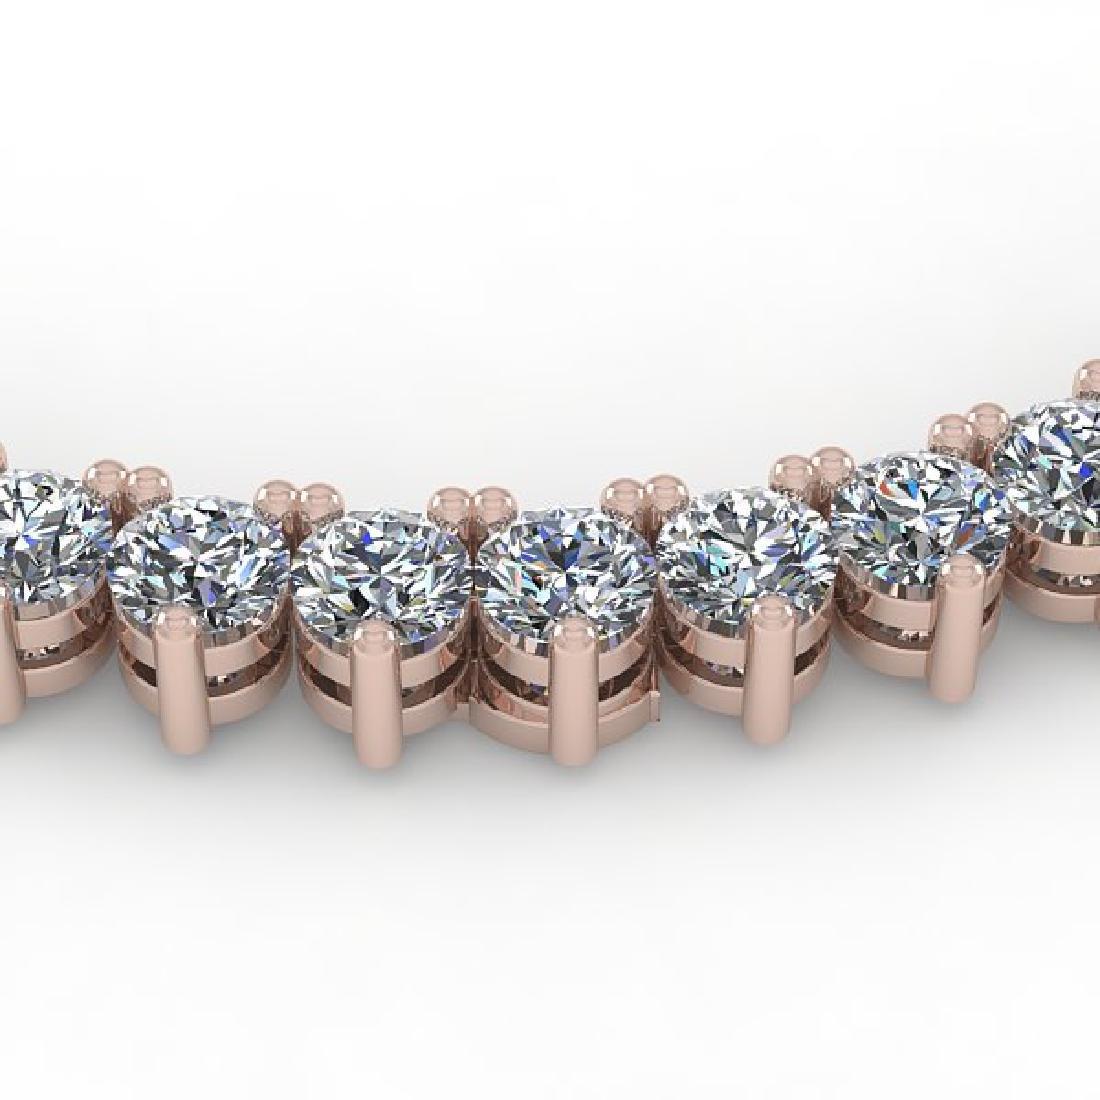 15 CTW Solitaire VS/SI Diamond Necklace 14K Rose Gold